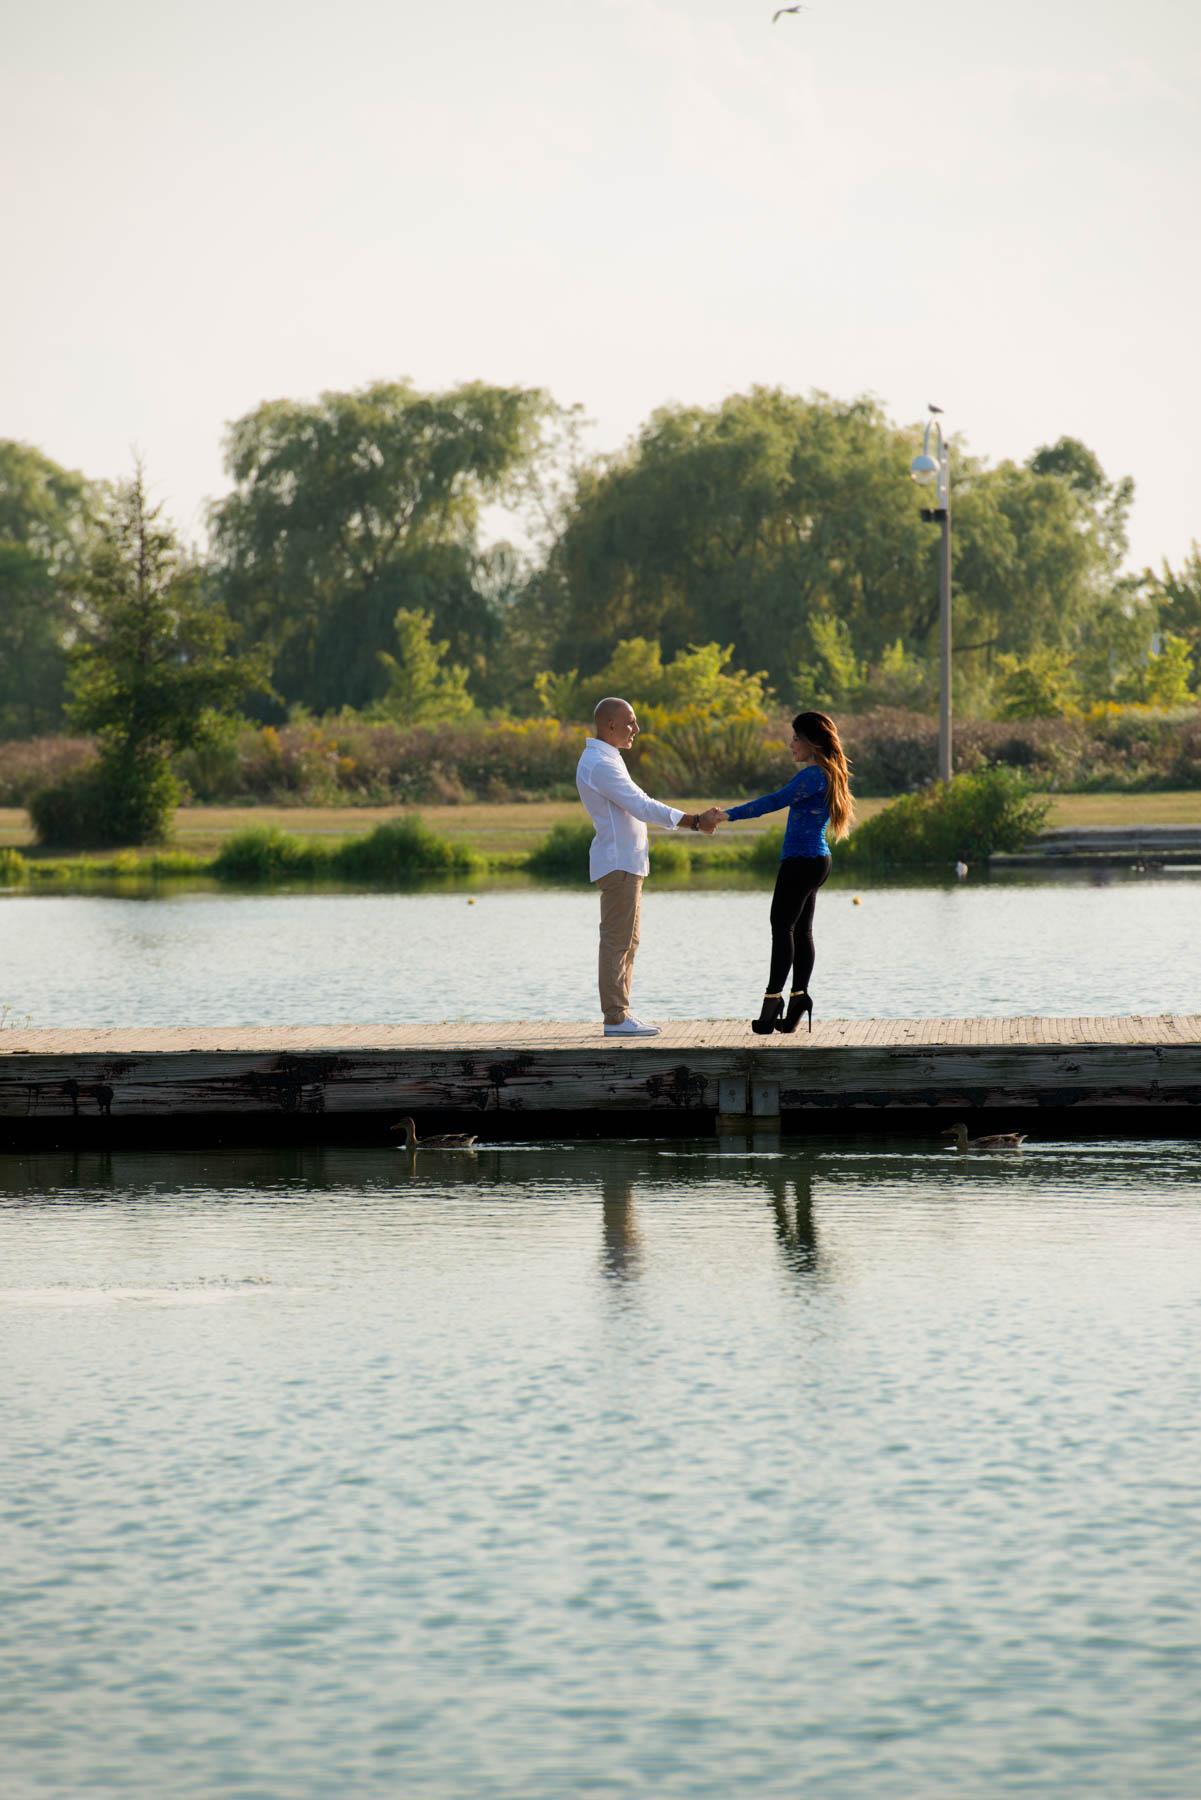 017 - Engagement FL Humber Bay Park - Toronto